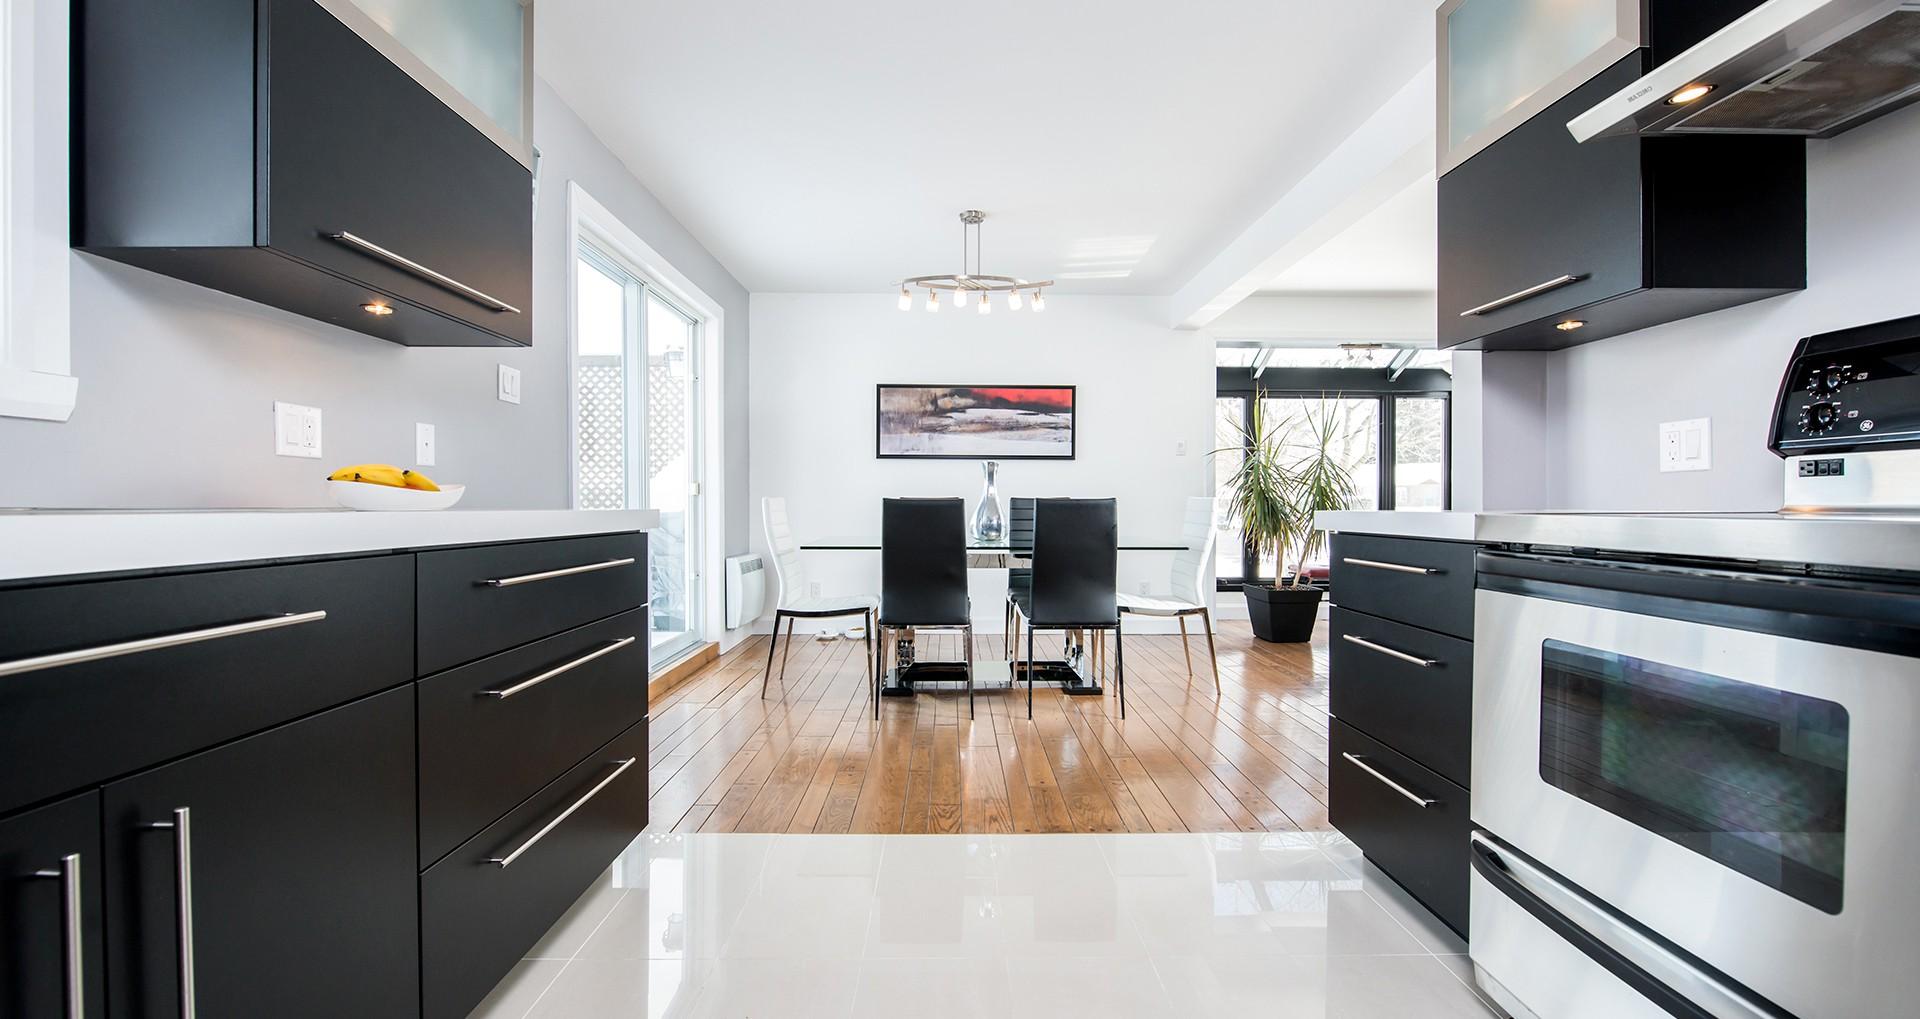 Bathroom kitchen cabinets custom furniture counters for Armoire de cuisine verdun